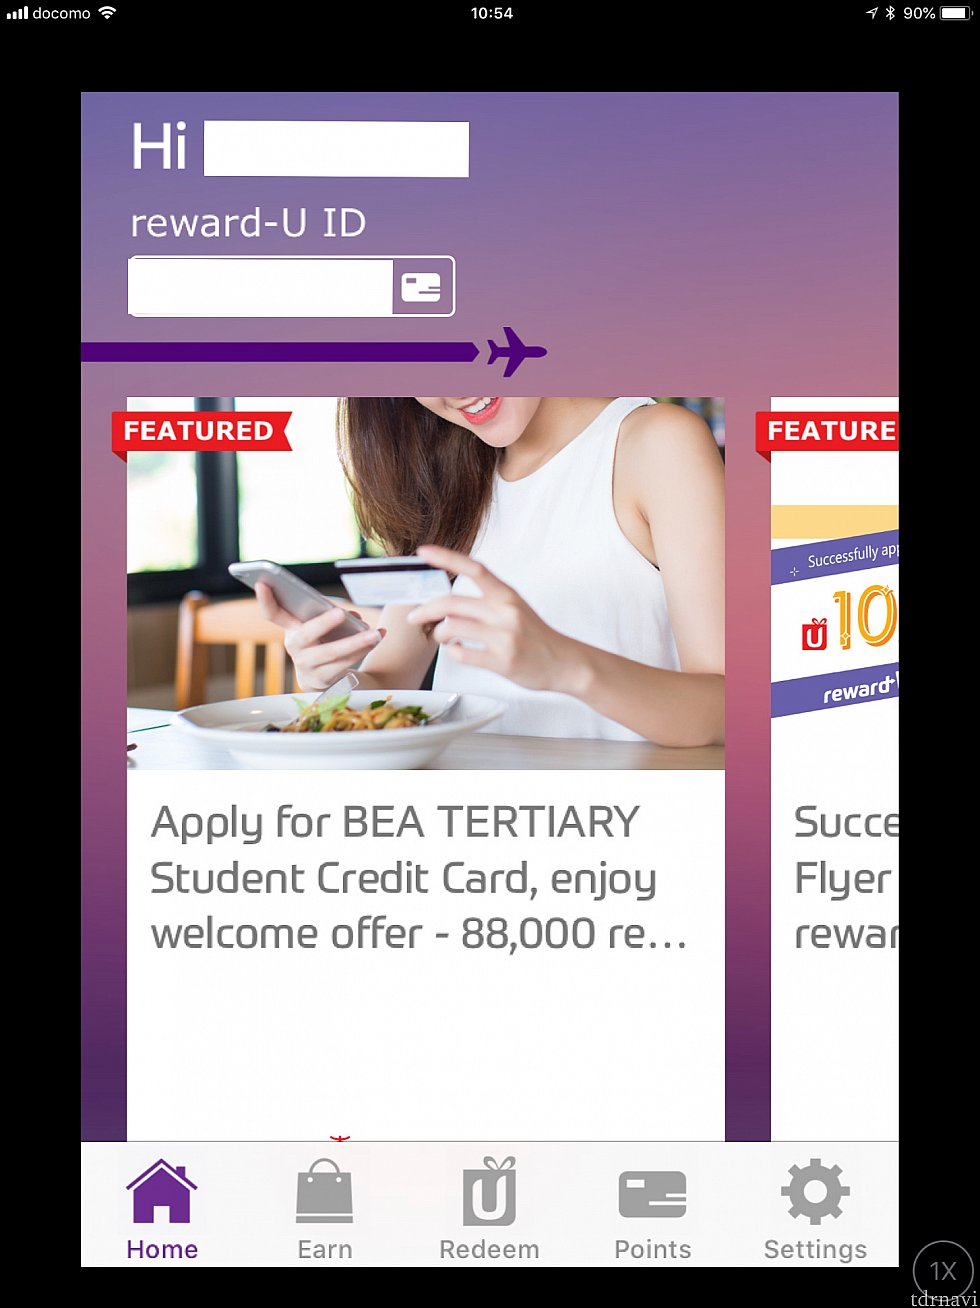 reward-Uアプリのトップ画面。予約する場合は下部中央の「Redeem」をタップします